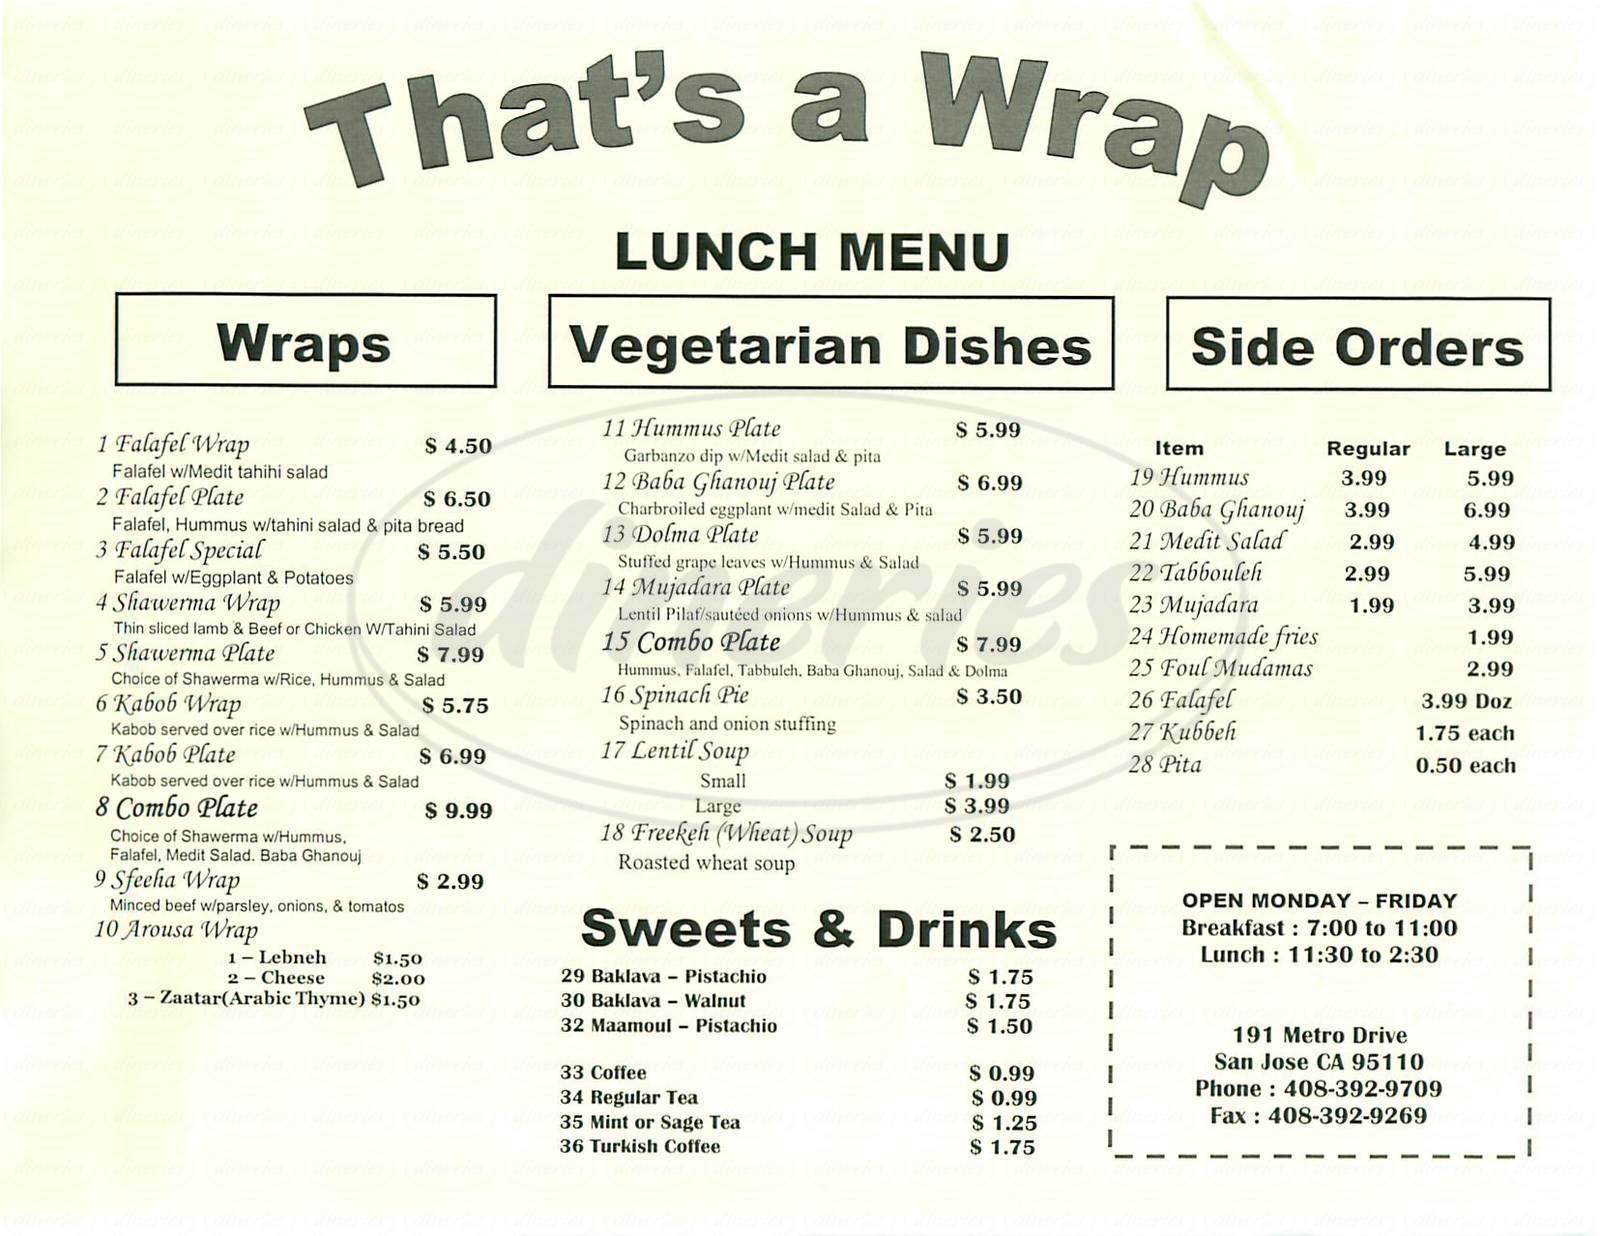 menu for That's a Wrap